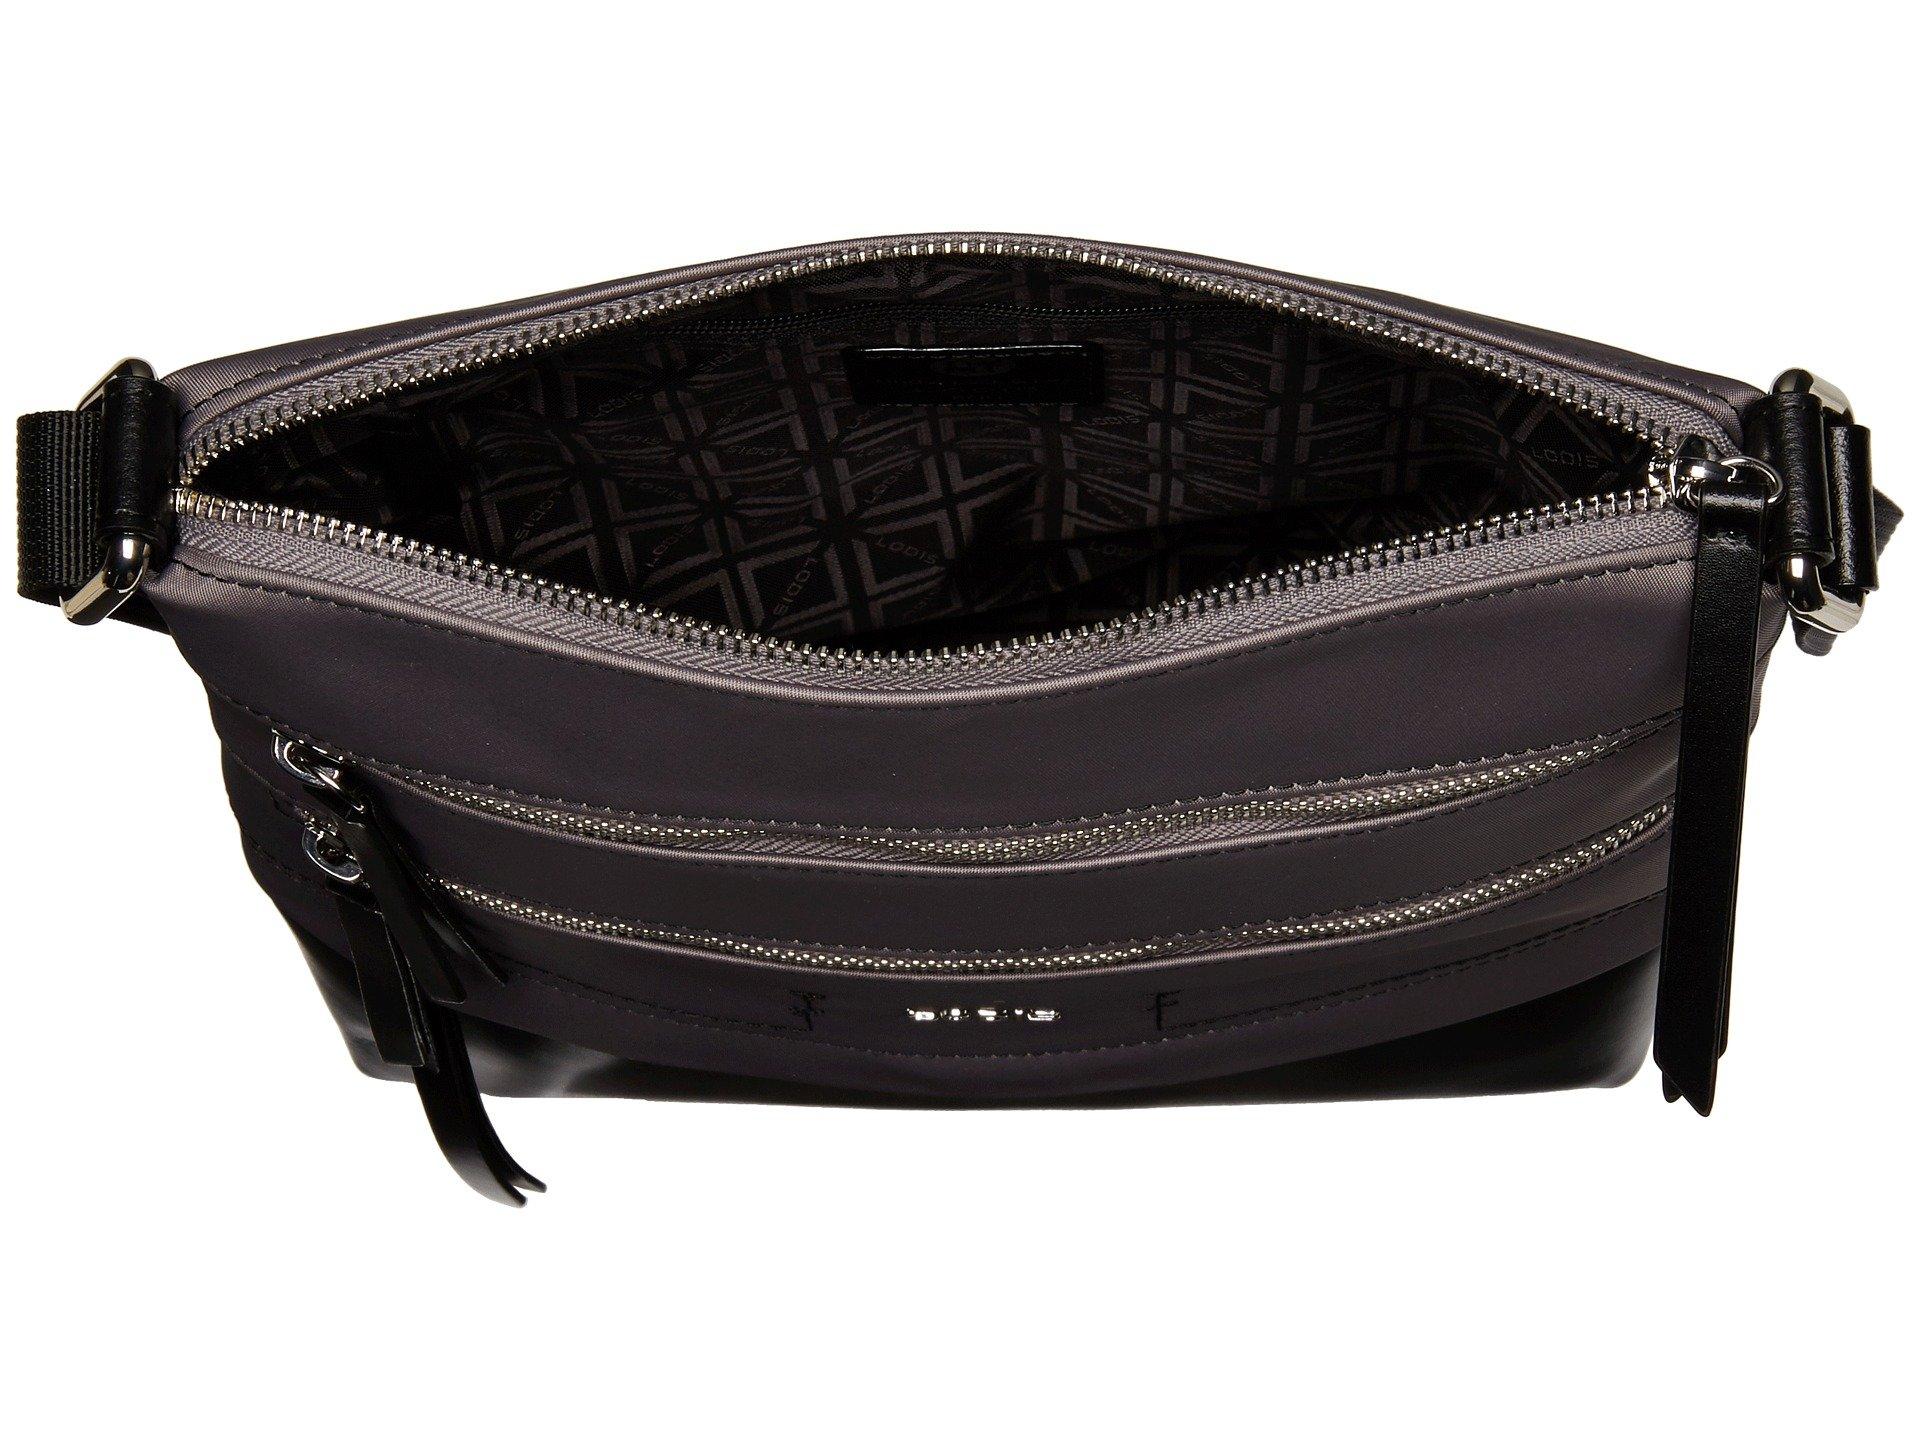 Nylon Grey Crossbody Sports Travel Lodis Wanda Accessories xUq6U4z